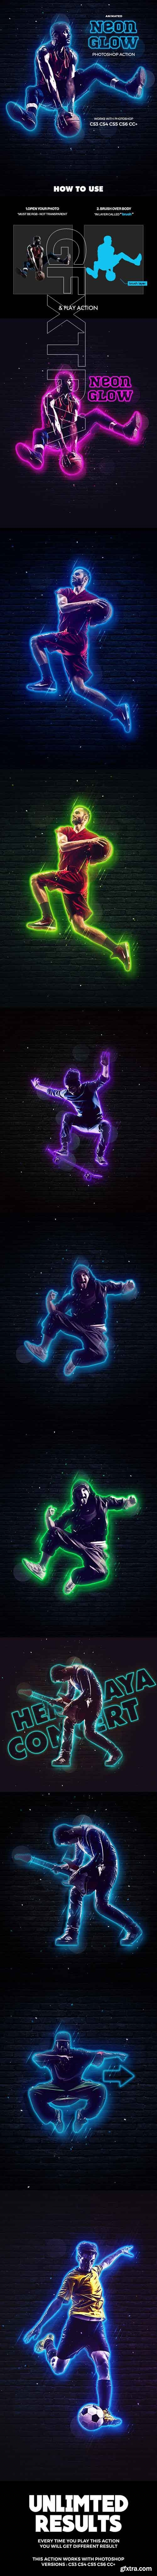 GraphicRiver - Neon Glow Photoshop Action - Animated 21048909